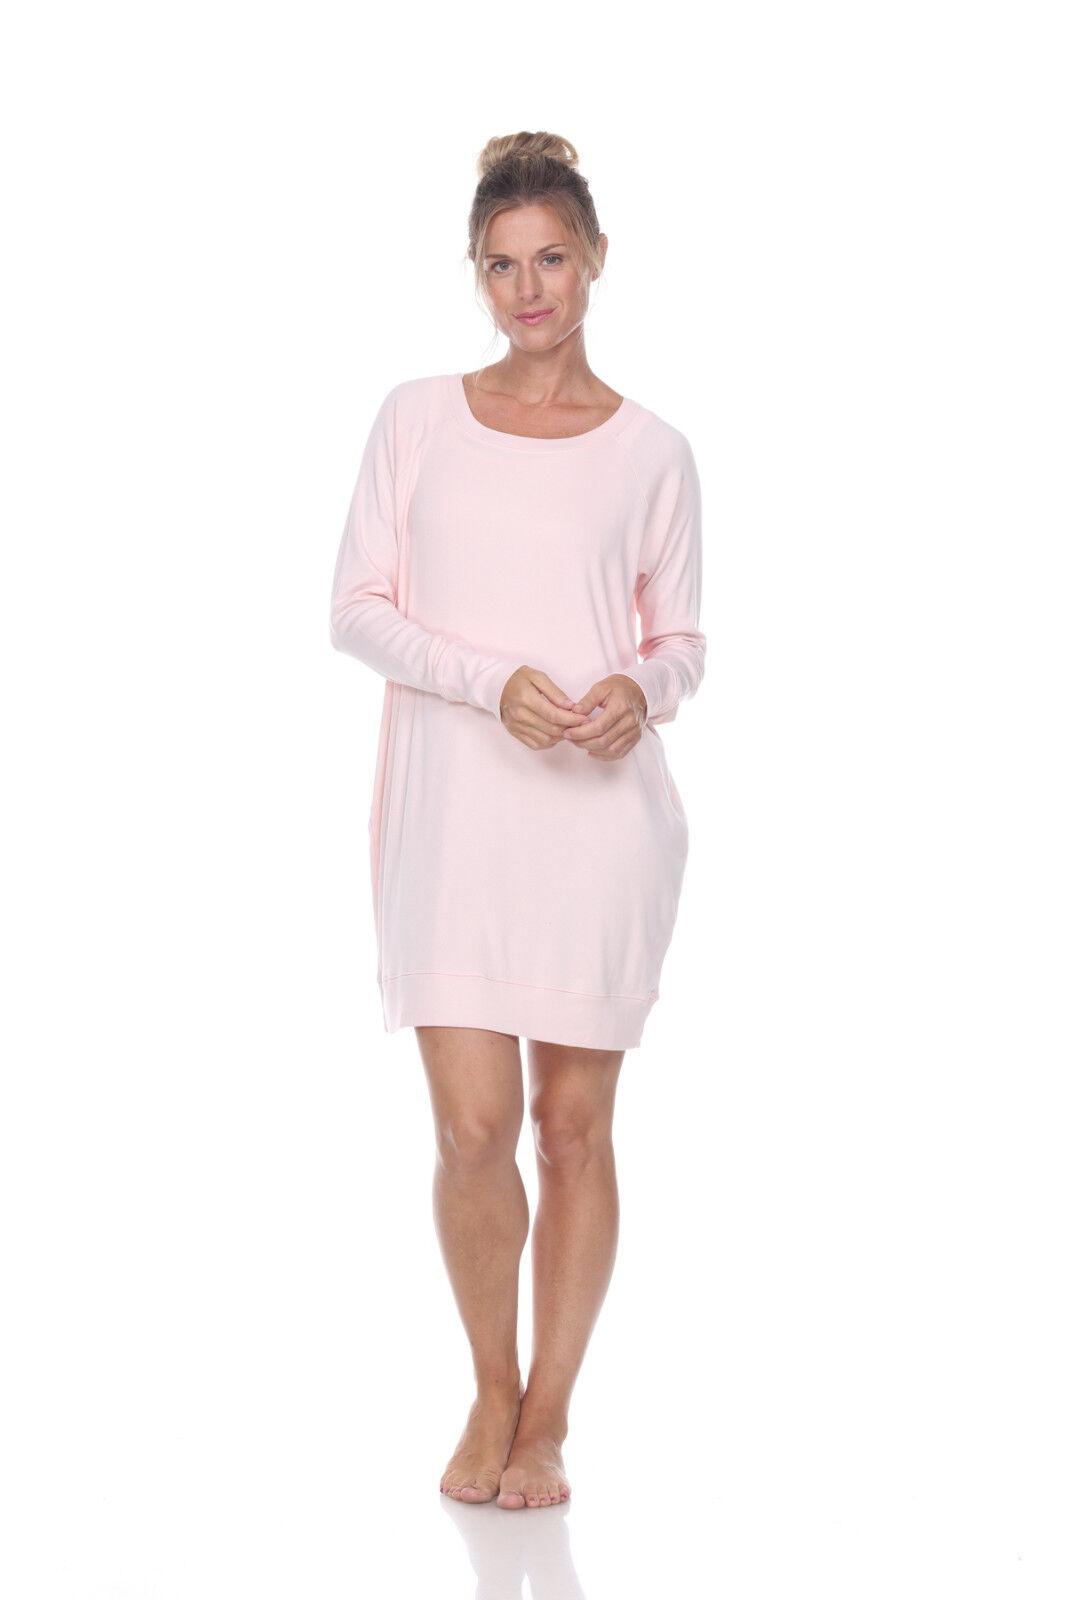 PJ Harlow Emily Long Sleeve Knit Sleep Shirt